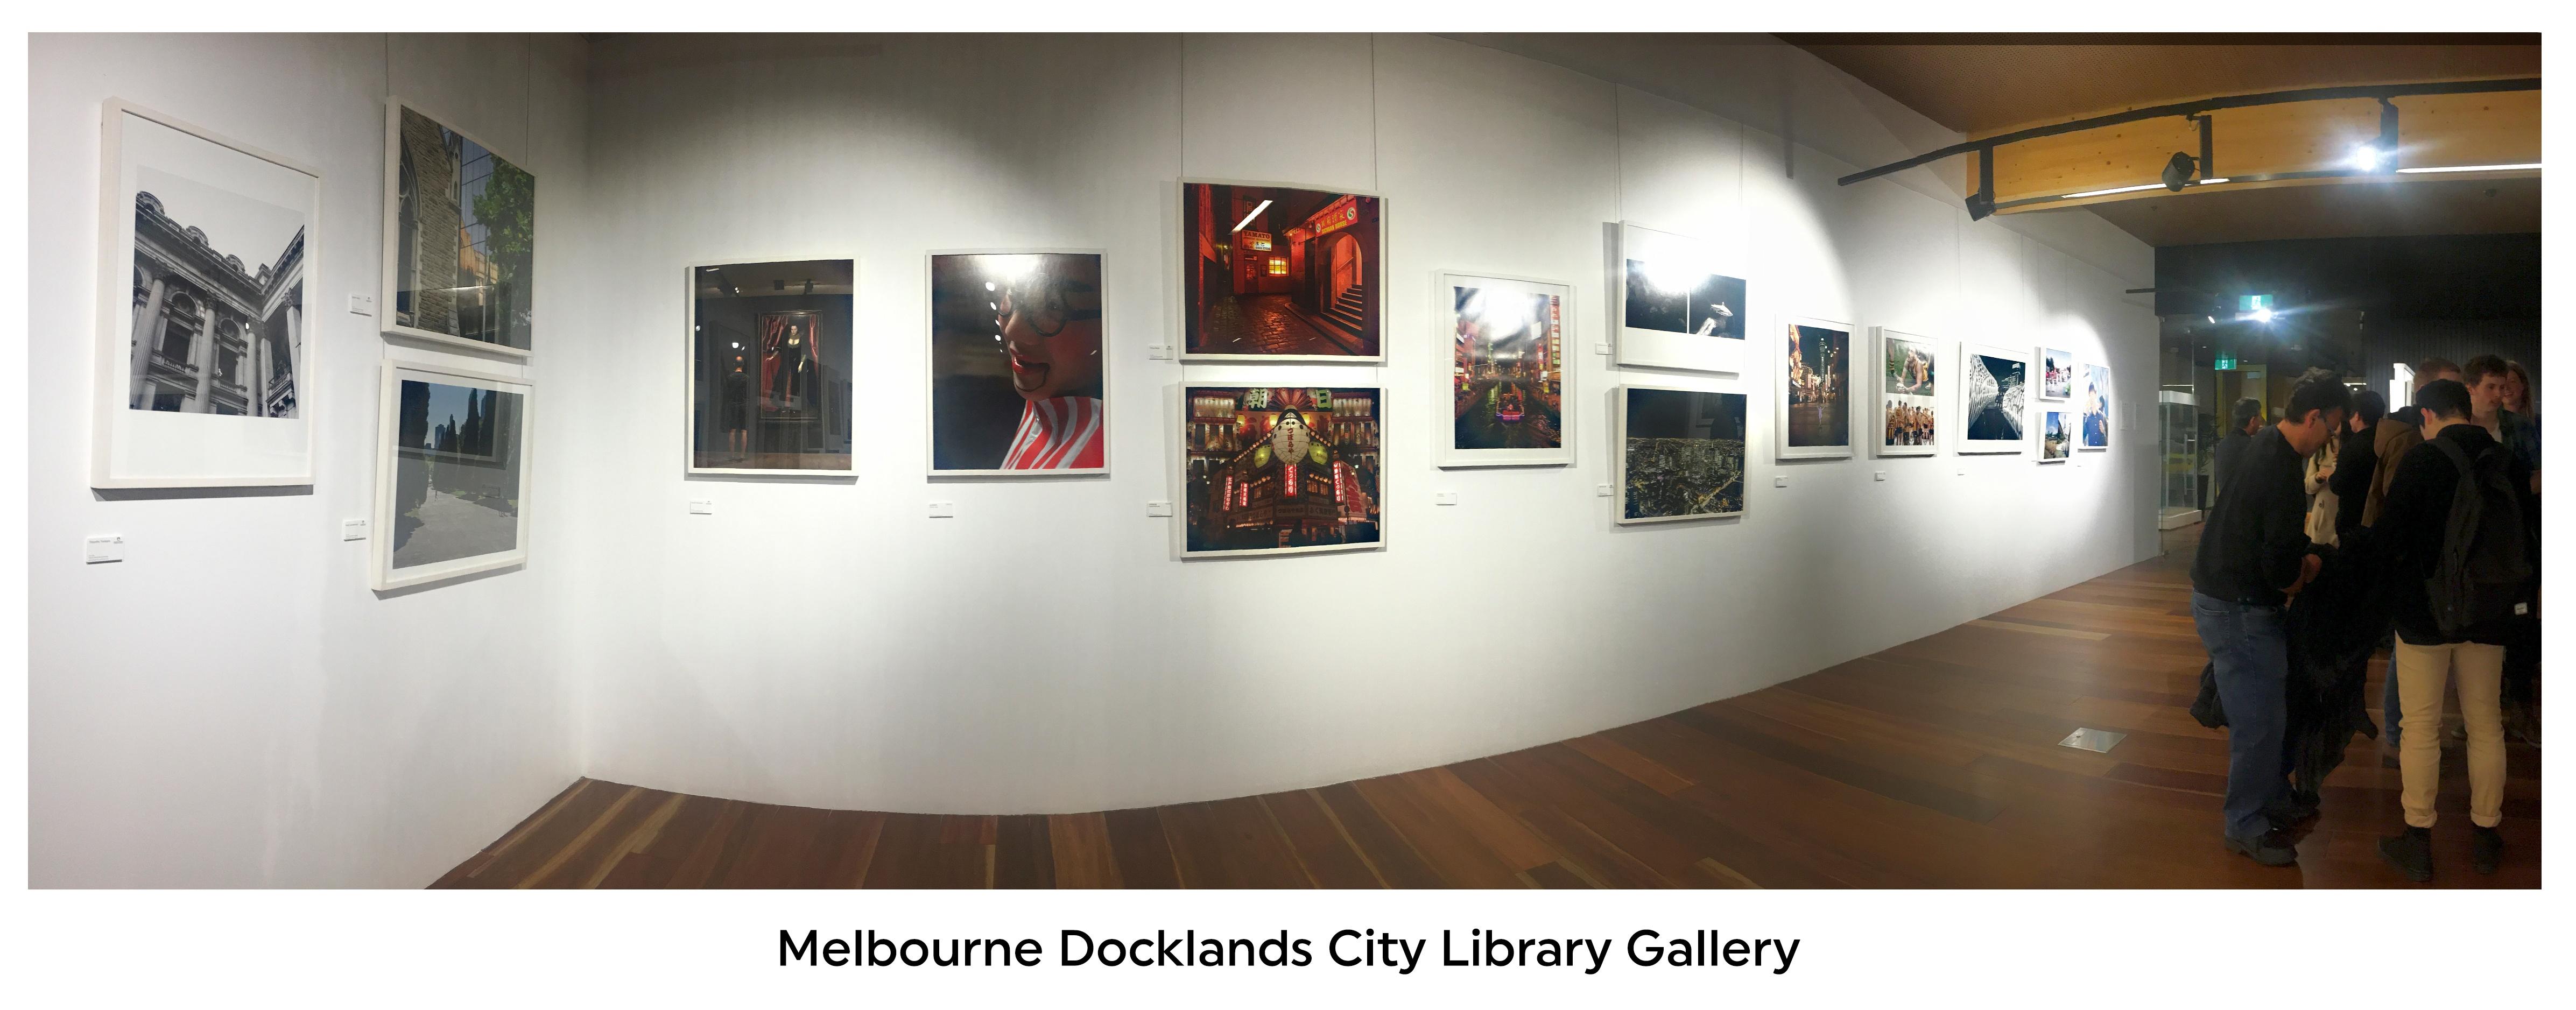 DockLibrary-1